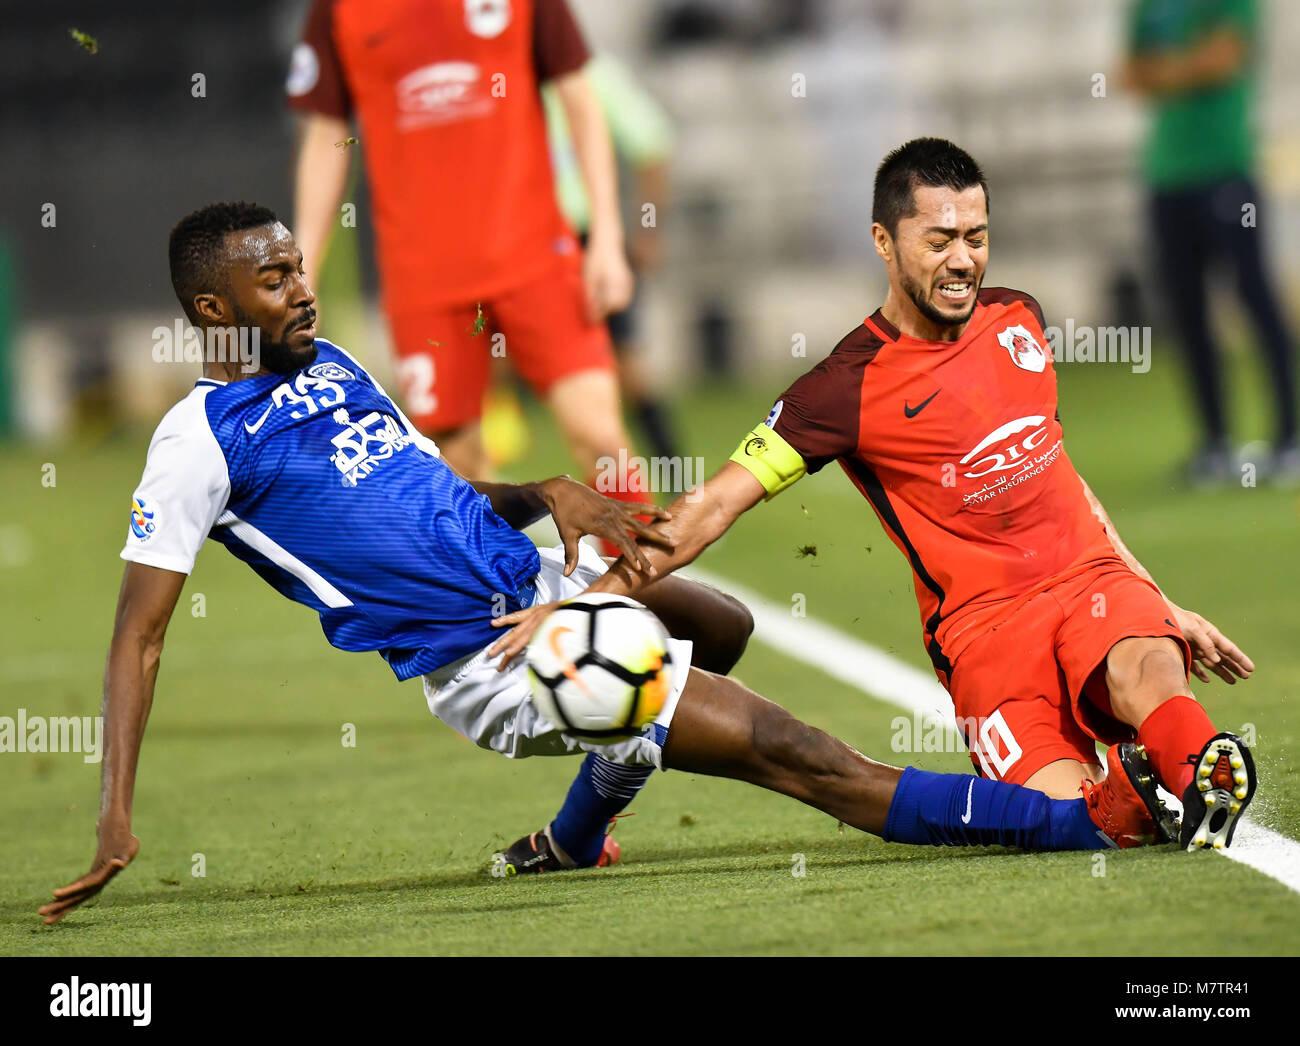 (180313) -- DOHA, March 13, 2018 (Xinhua) -- Osama Hawsawi (L) of Al-Hilal FC vies with Rodrigo Tabata of Al-Rayyan Stock Photo